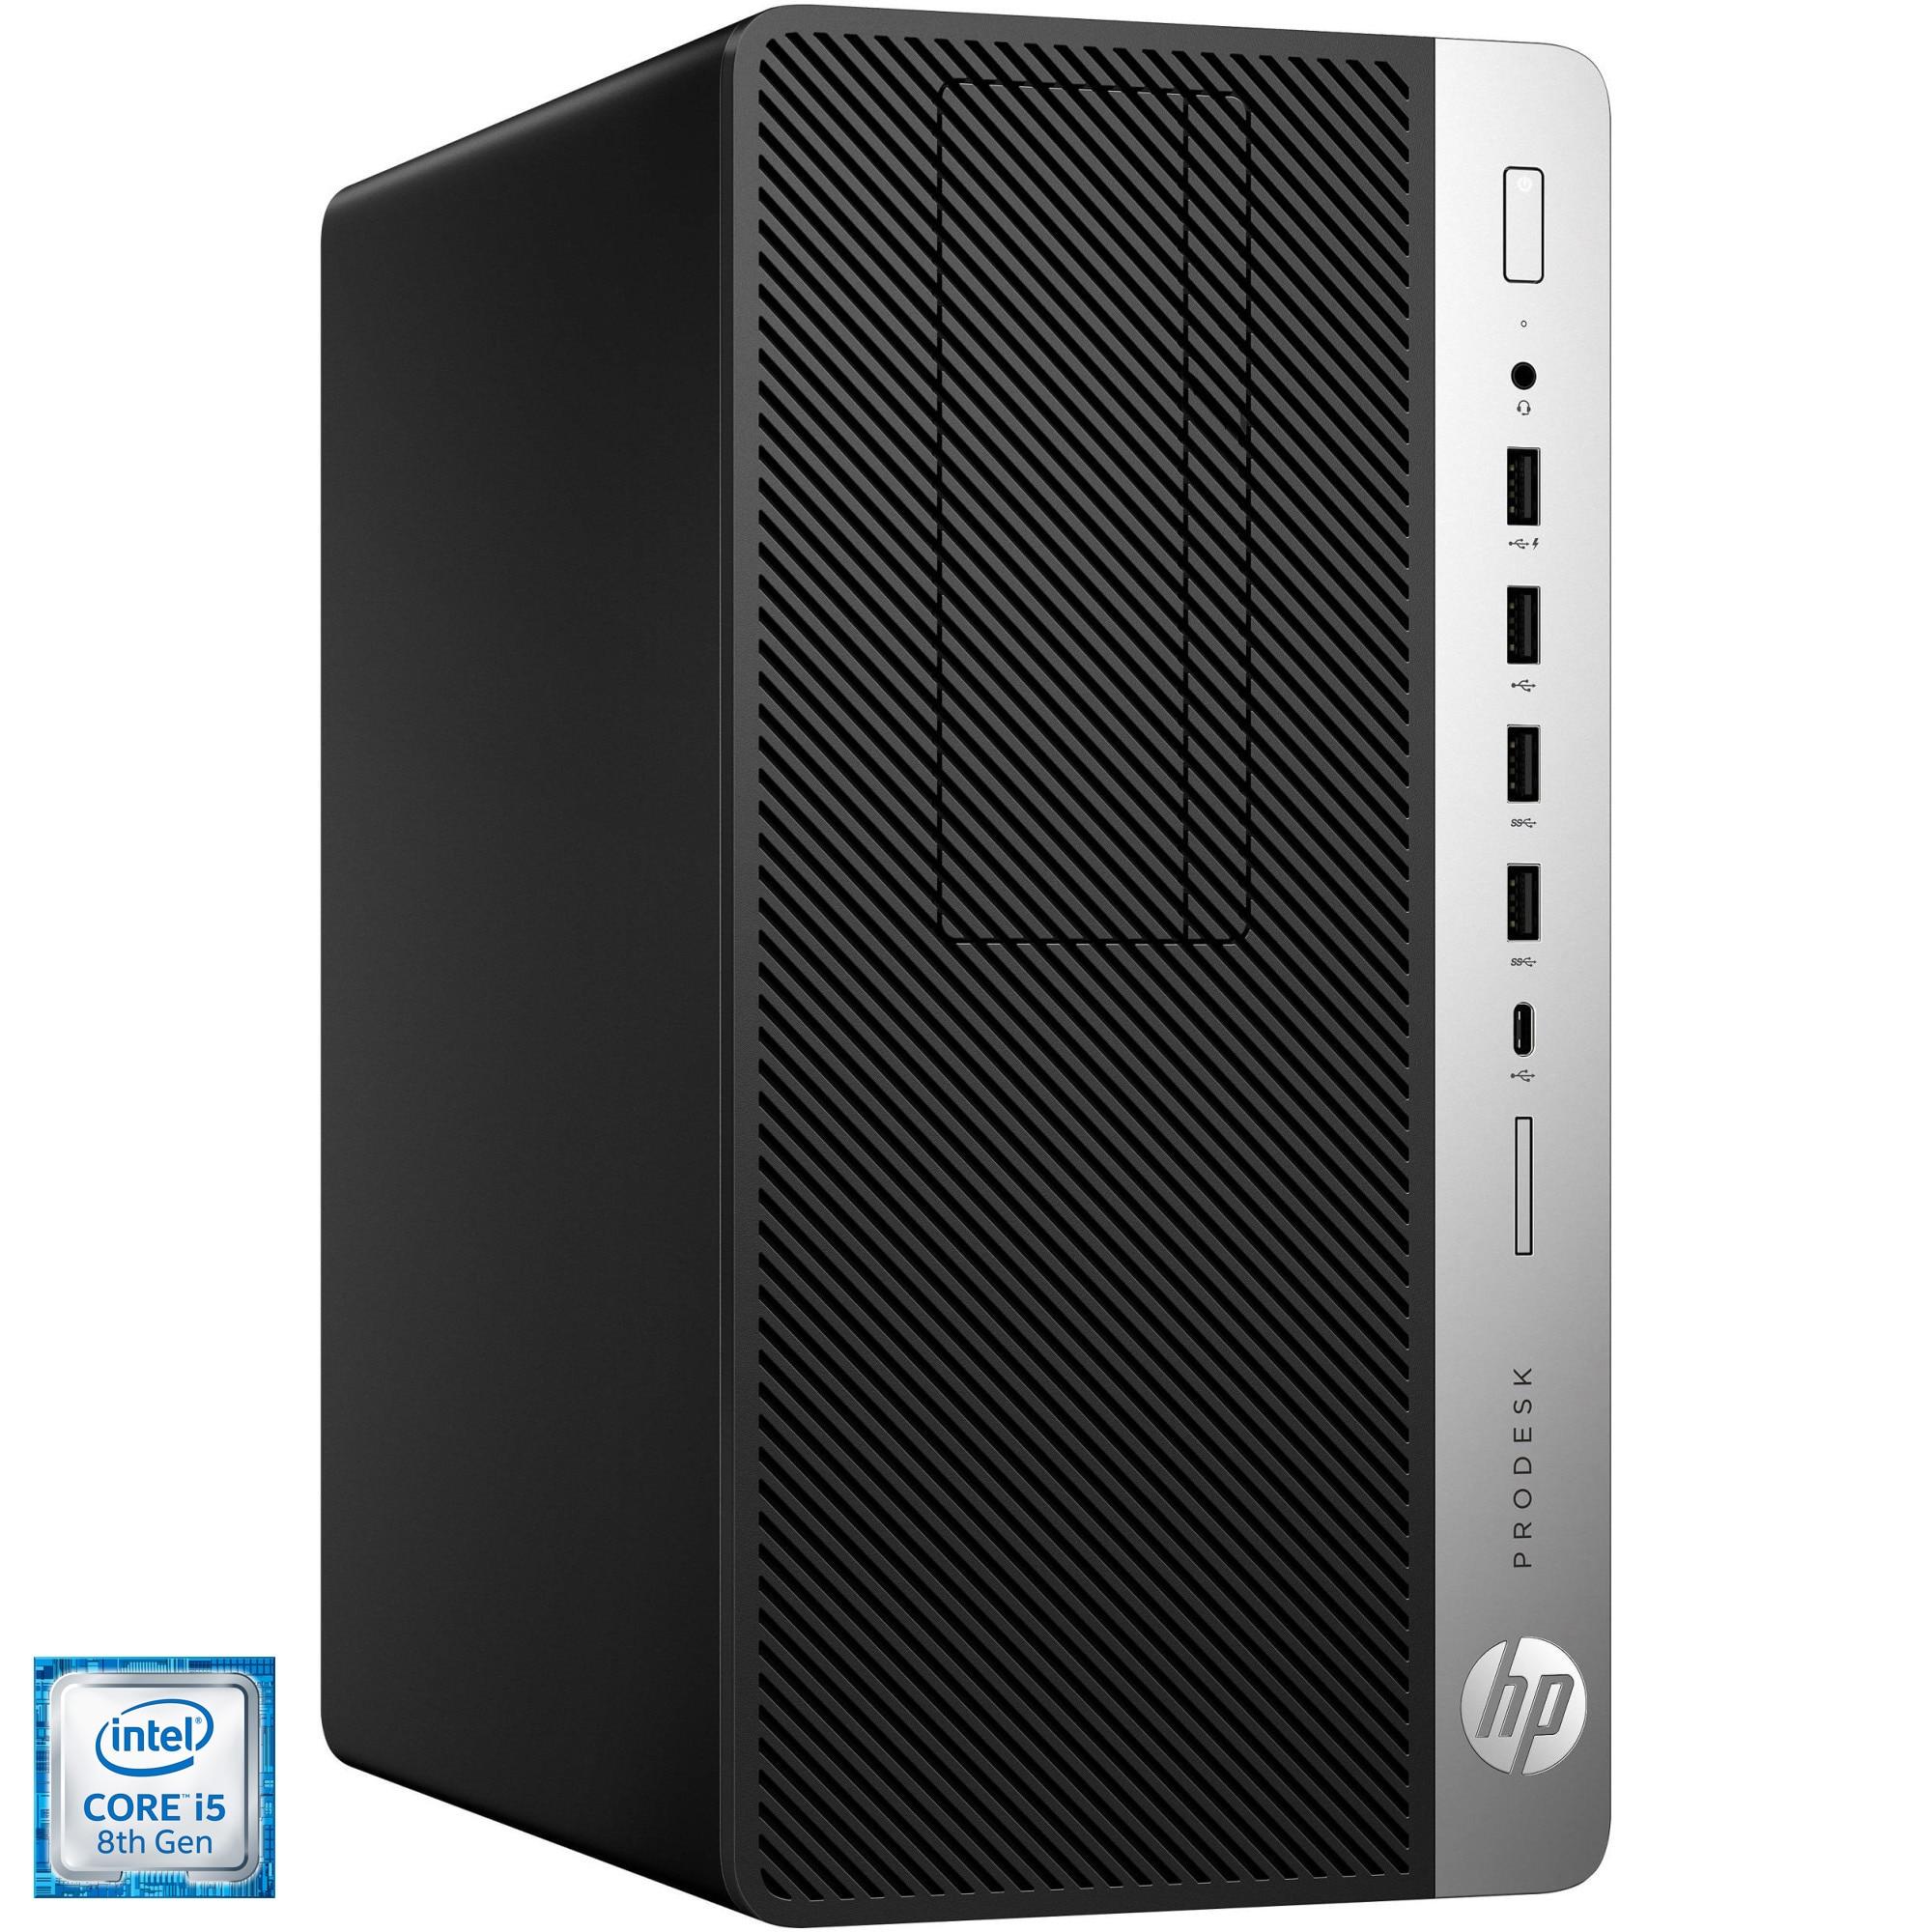 Fotografie Sistem Desktop PC HP ProDesk 600 G5 MT cu procesor Intel® Core™ i5-8500 pana la 4.10 GHz, Coffee Lake, 8GB DDR4, DVD-RW, 256GB SSD + 512GB SSD, Intel® UHD Graphics 630, Free DOS